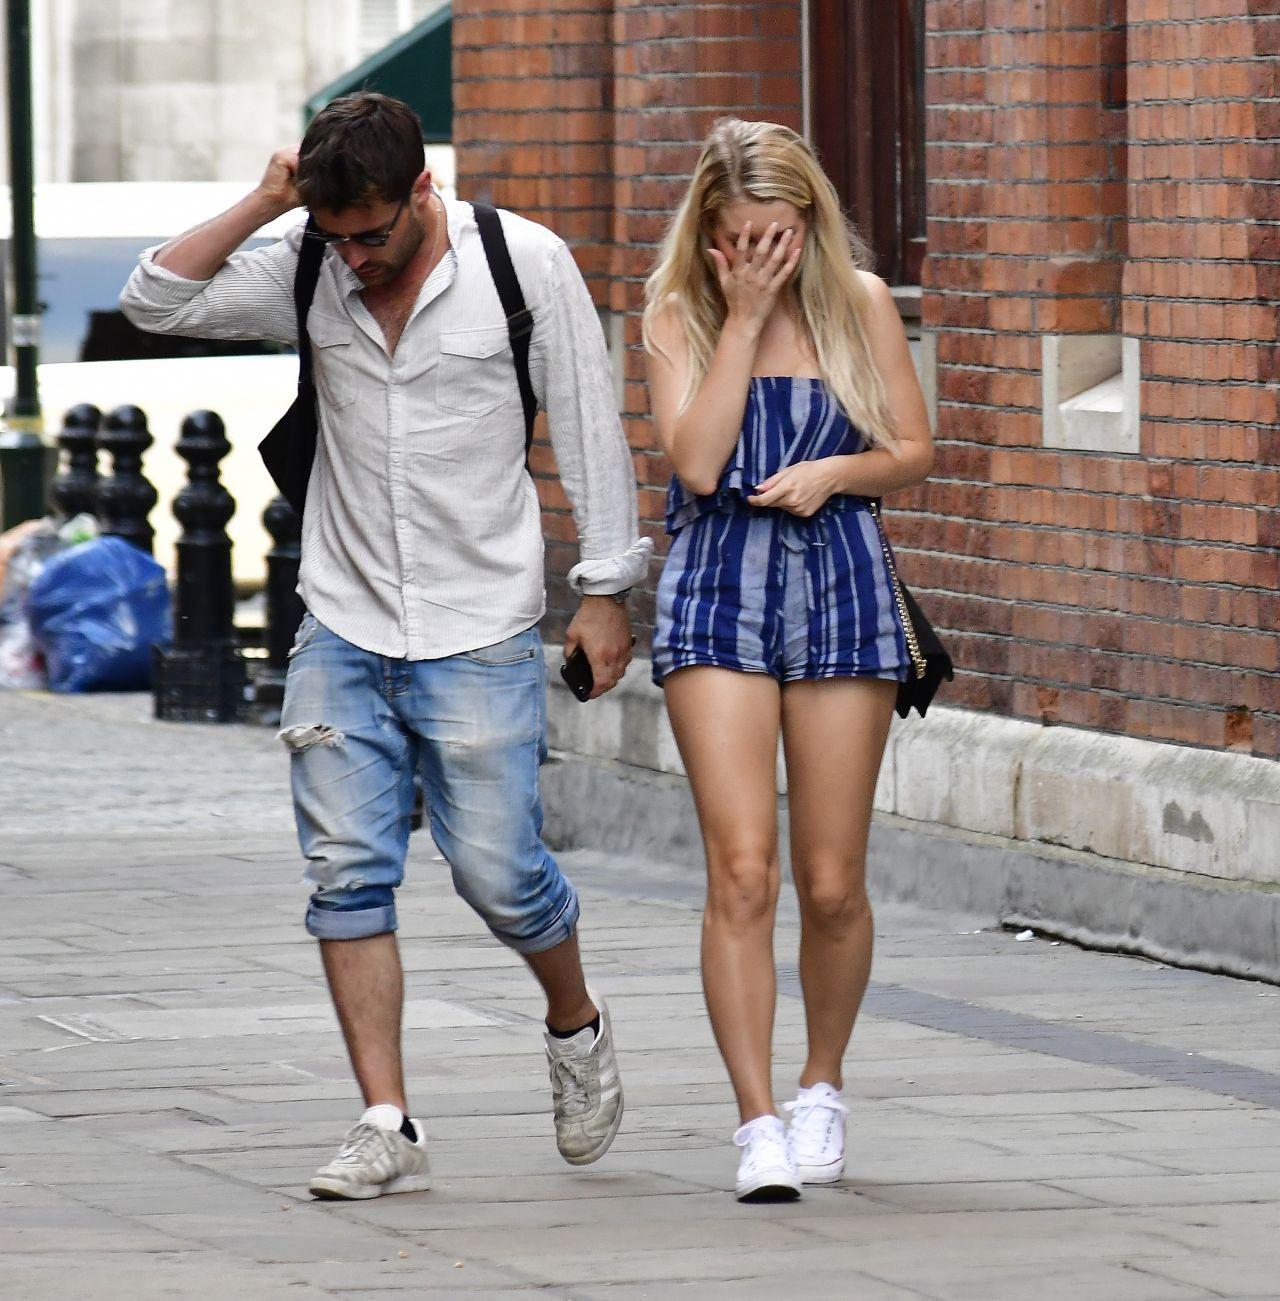 lottie dating Meet singles in lottie interested in dating new people on zoosk date smarter and meet more singles interested in dating.